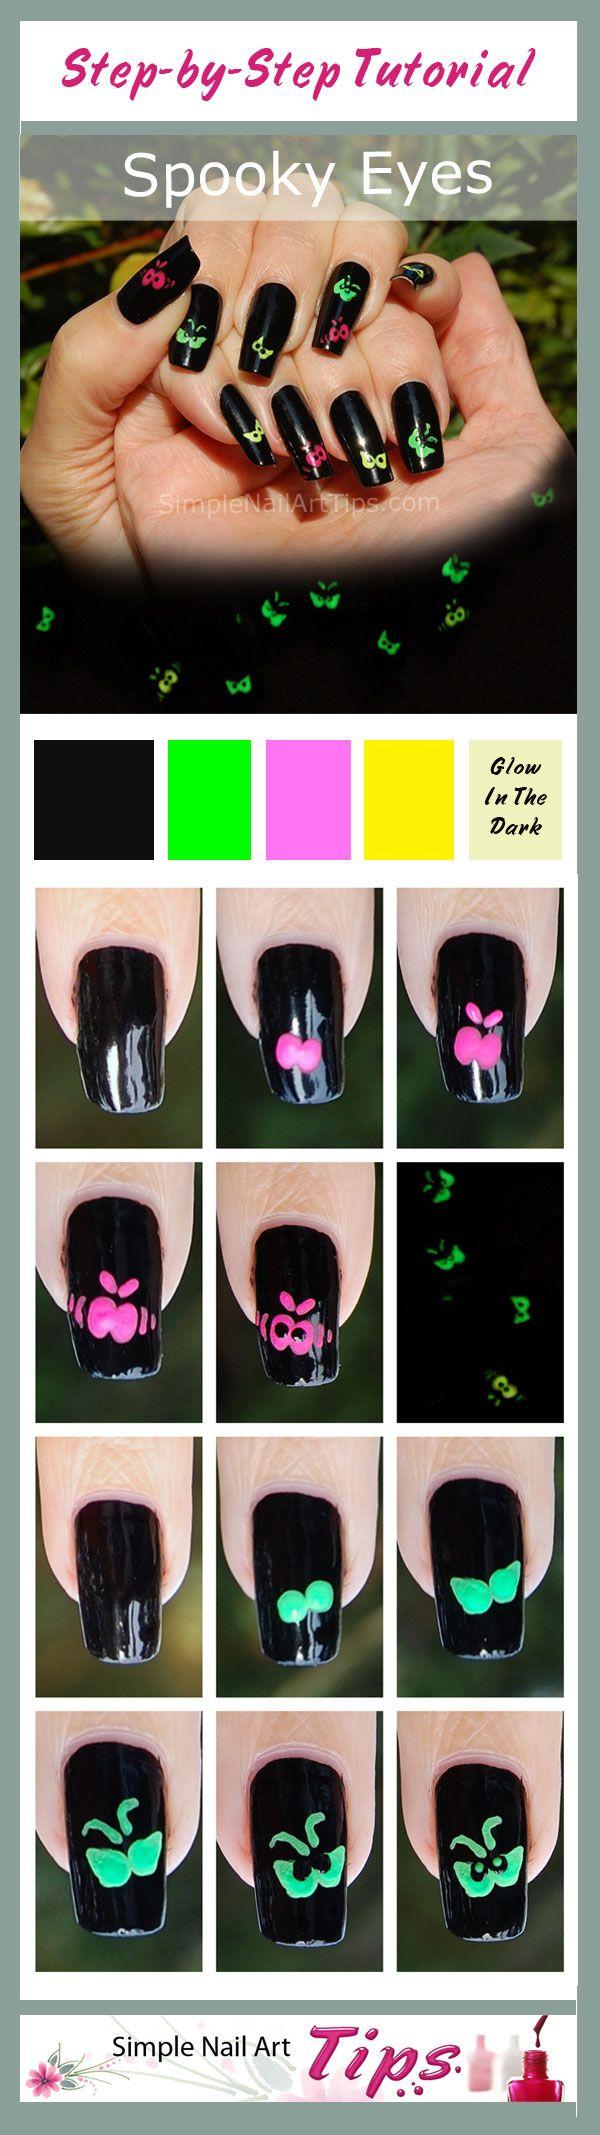 SIMPLE TUTORIAL: www.SimpleNailArtTips.com - Halloween Nails - Spooky Eyes, Glow-in-the-Dark  #nails #nailart #manicure